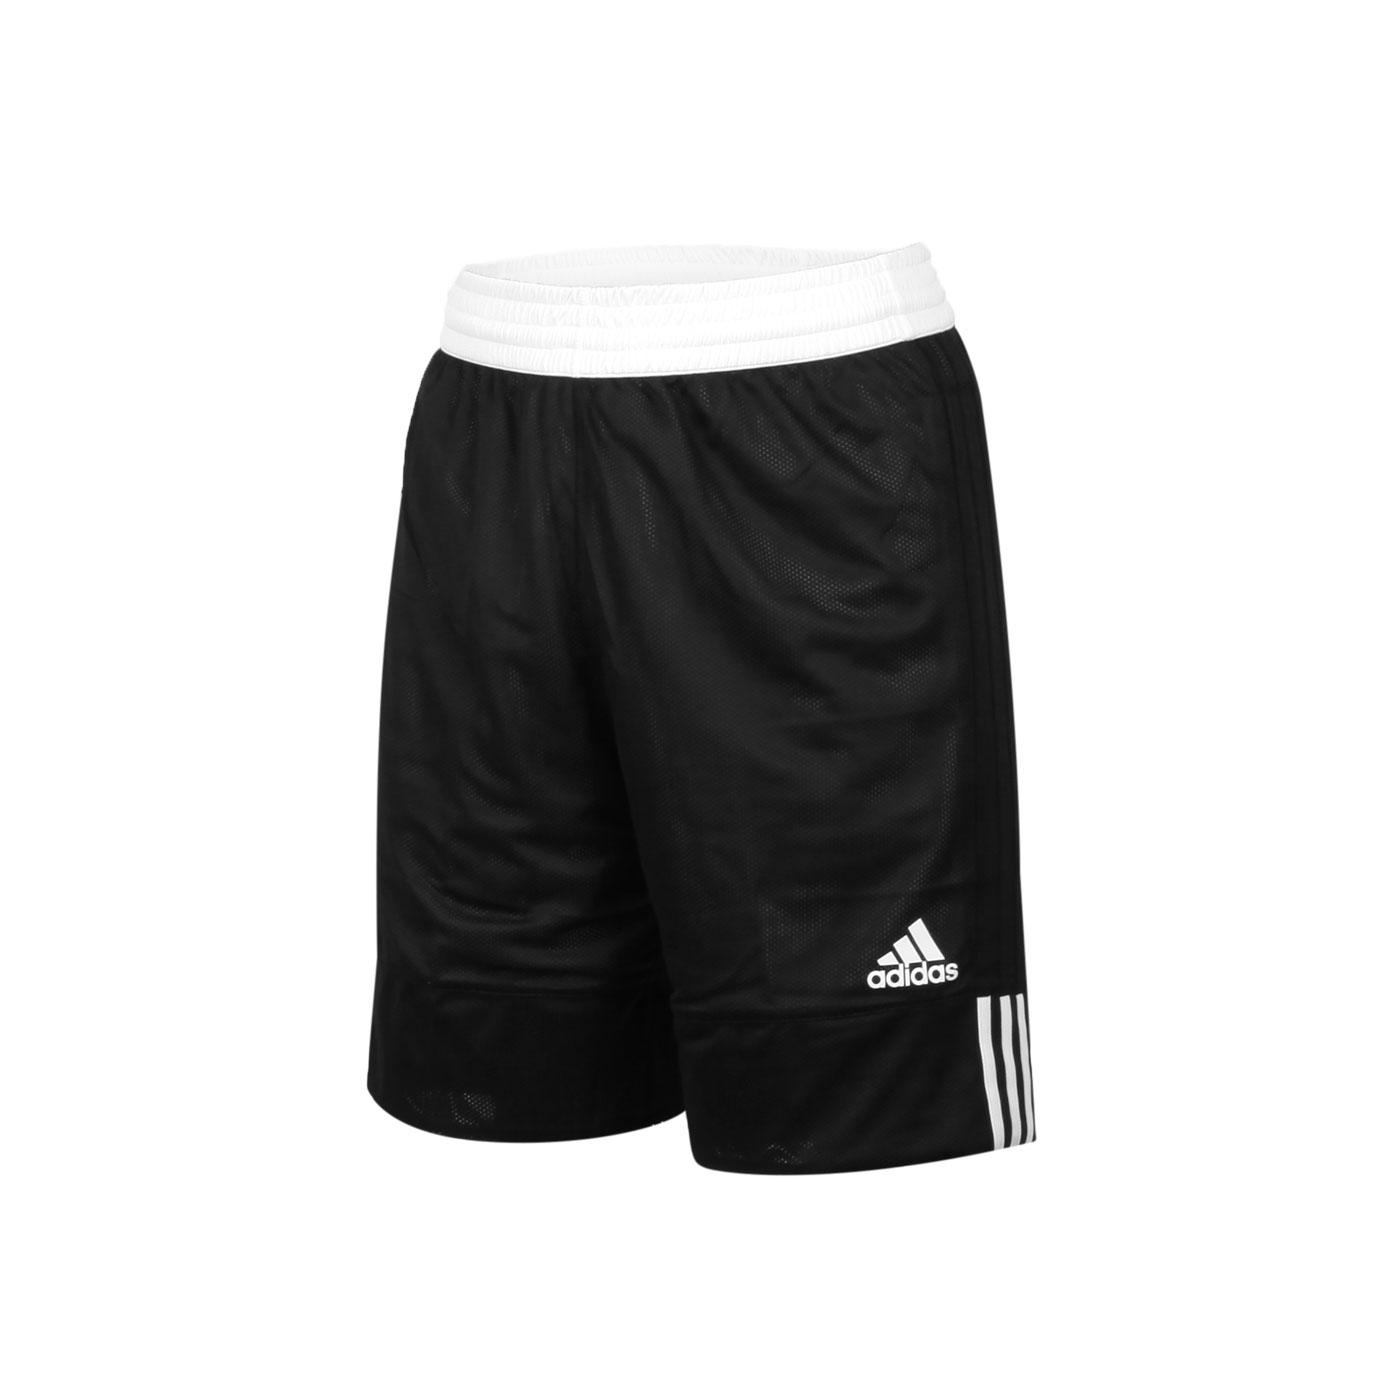 ADIDAS 男款雙面籃球短褲 DX6386 - 黑白